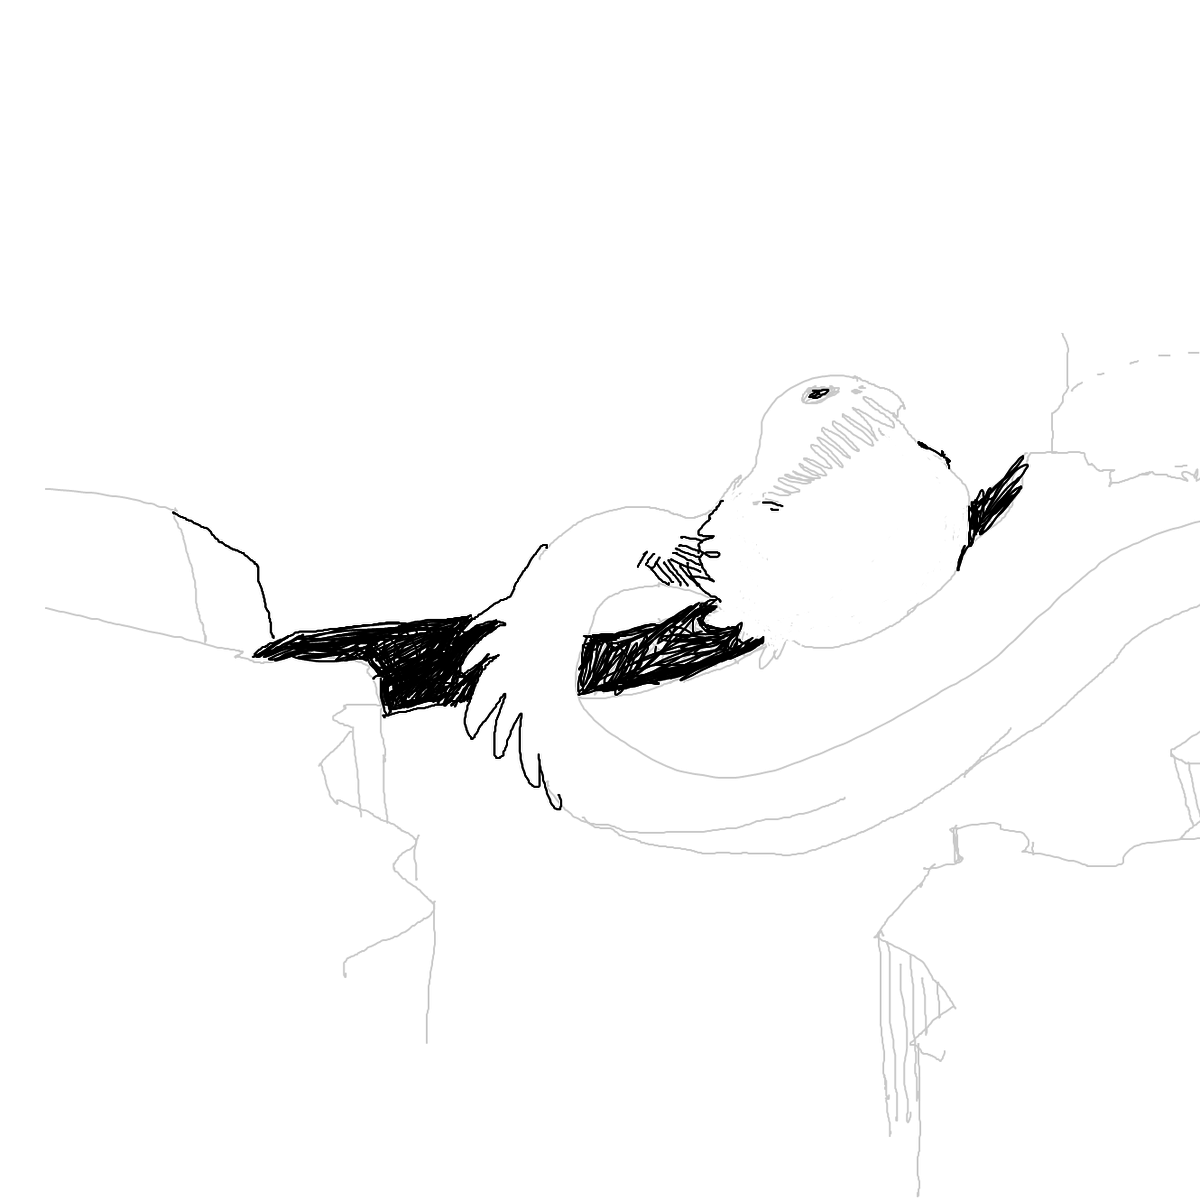 BAAAM drawing#22143 lat:78.4192276000976600lng: -4.4741134643554690